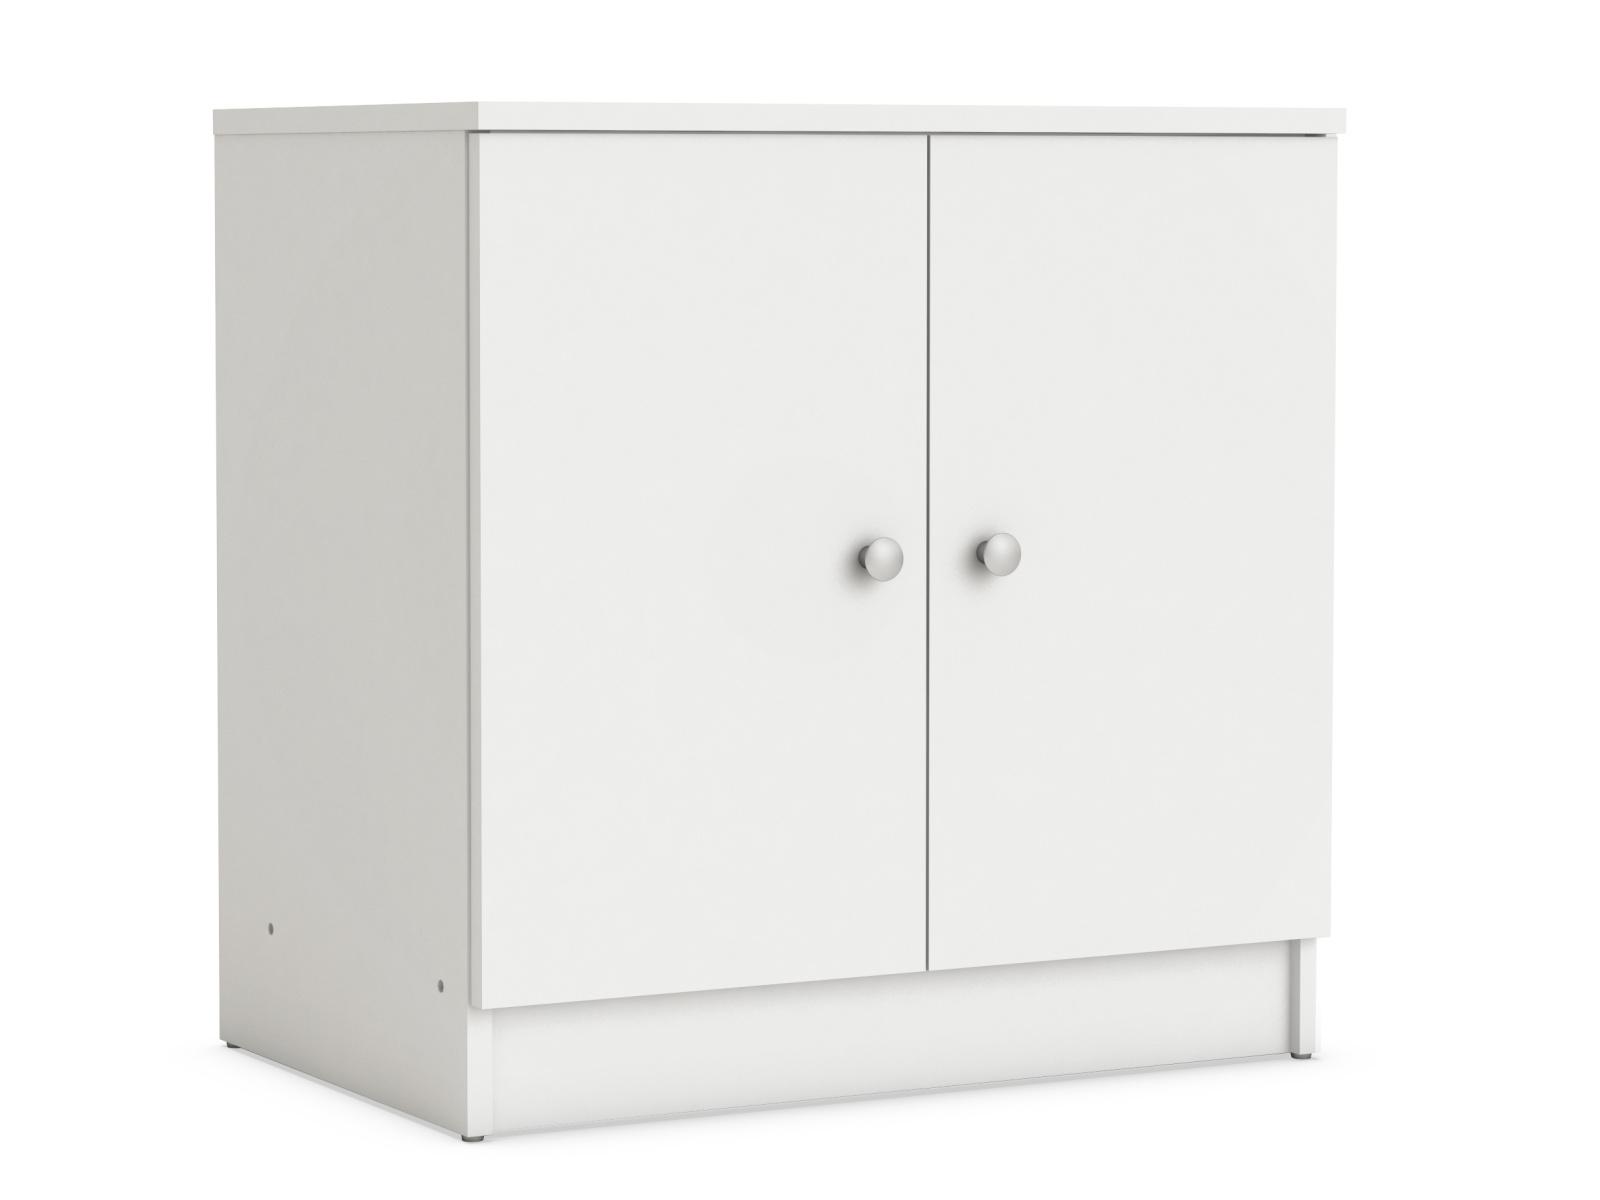 DEMEYERE AKVA koupelnová skříňka, bílá